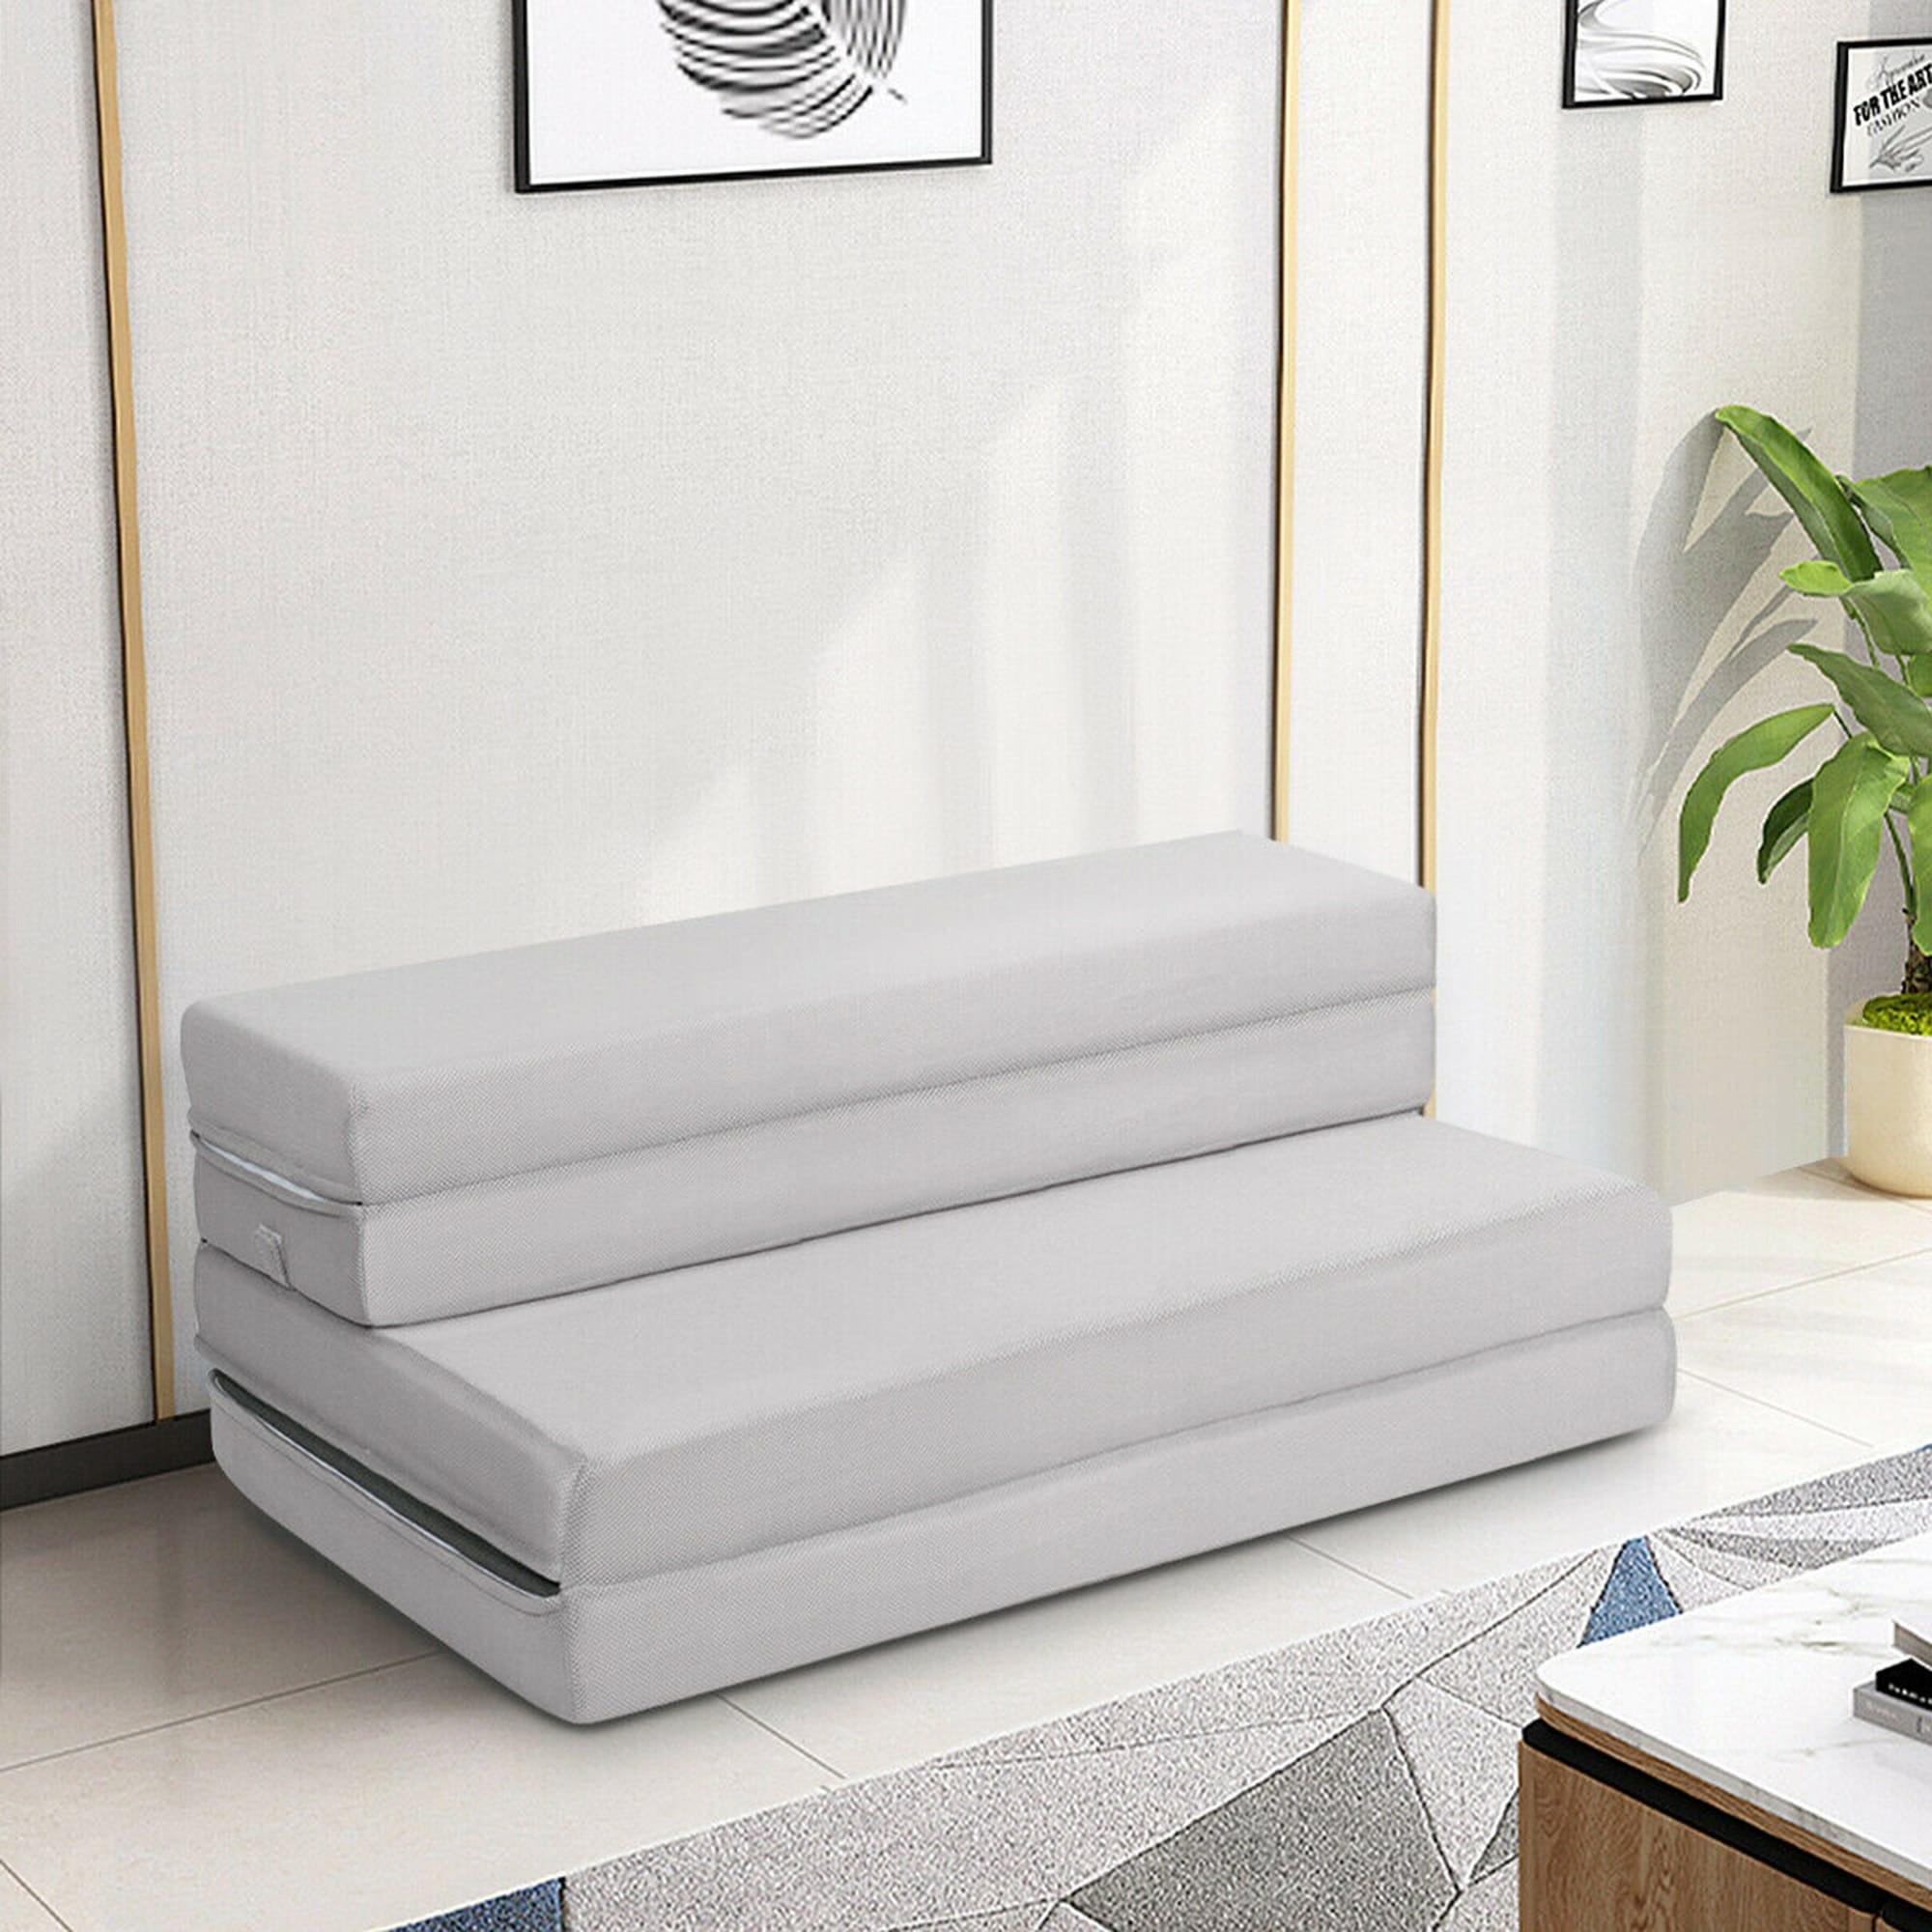 Gymax 4 Twin Xl Size Foam Folding Mattress Sofa Bed Guests Floor Mat On Sale Overstock 23159638